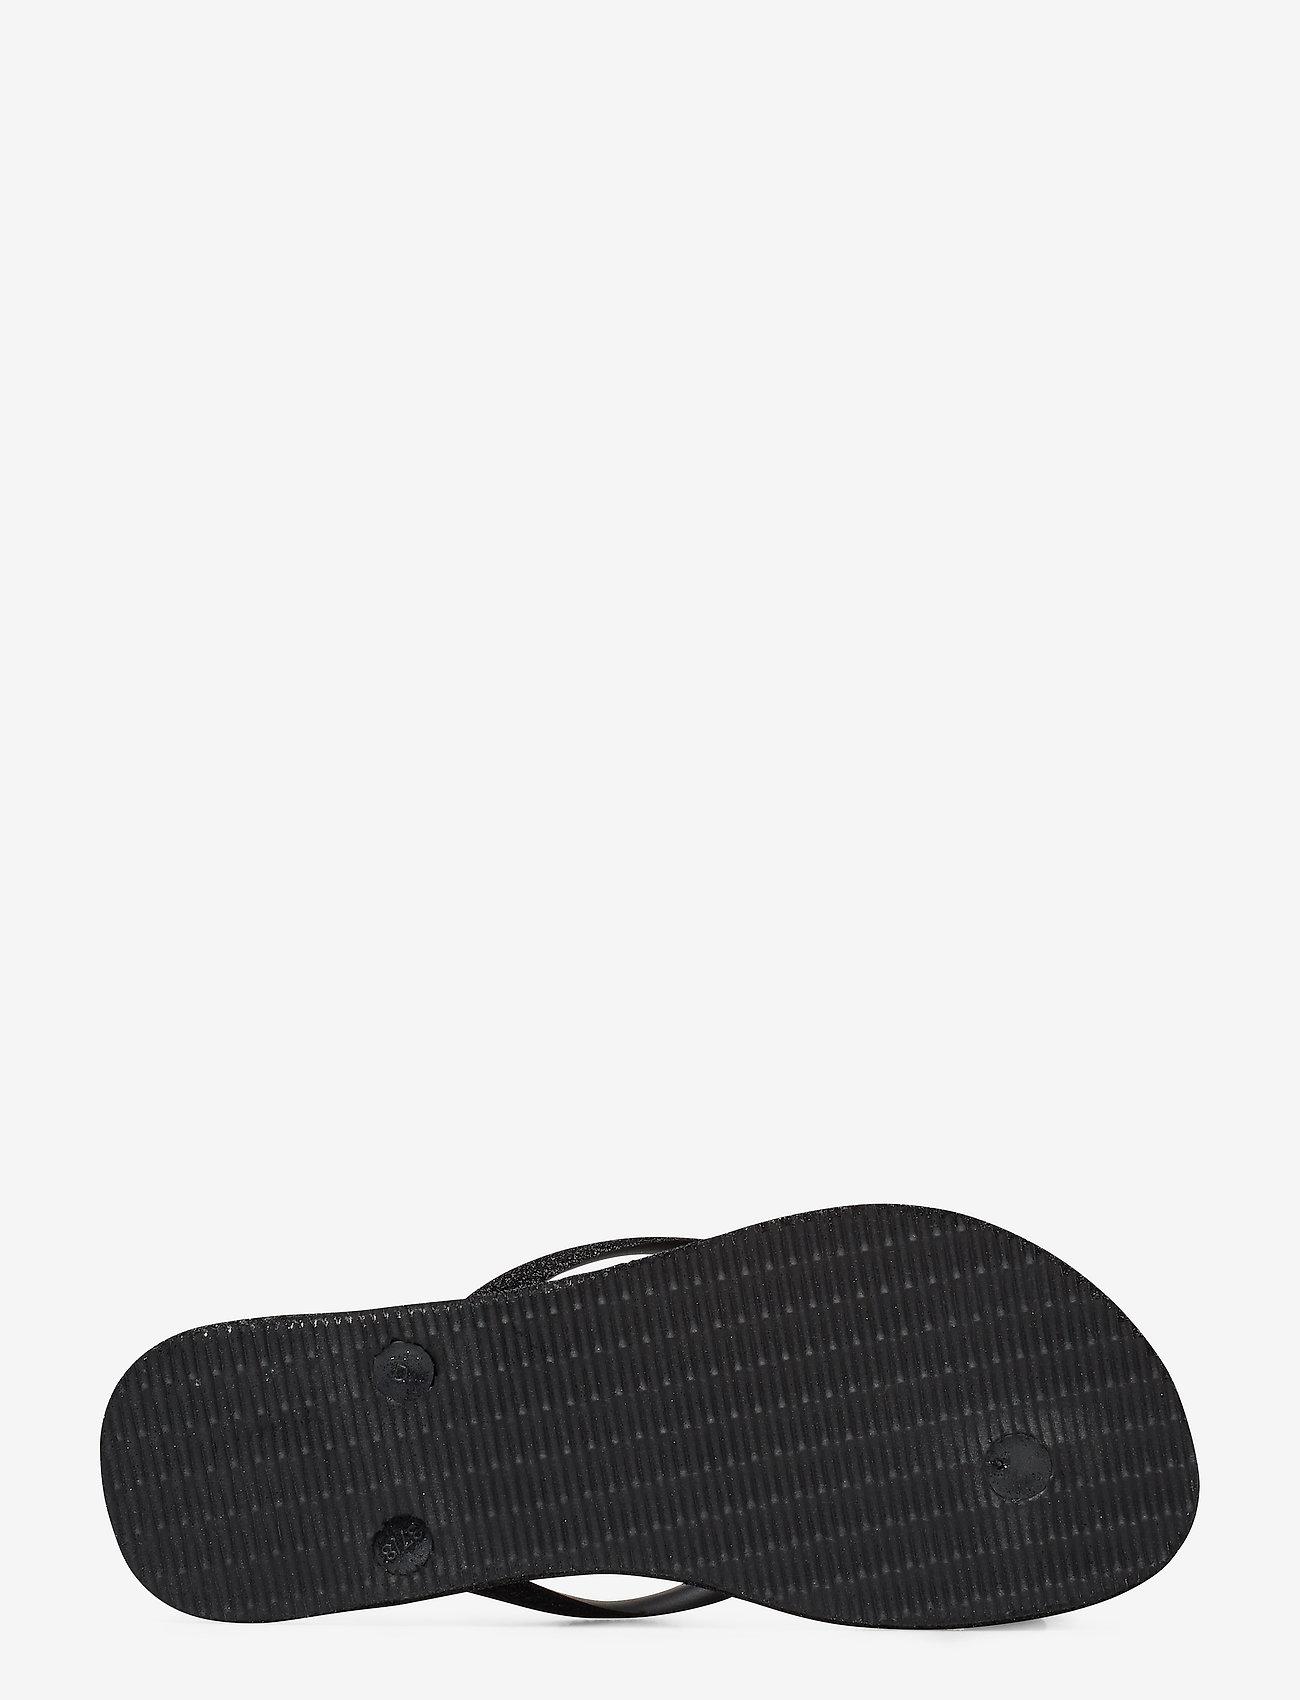 Hav Slim Sparkle (Black 0090) (26 €) - Havaianas gelgb